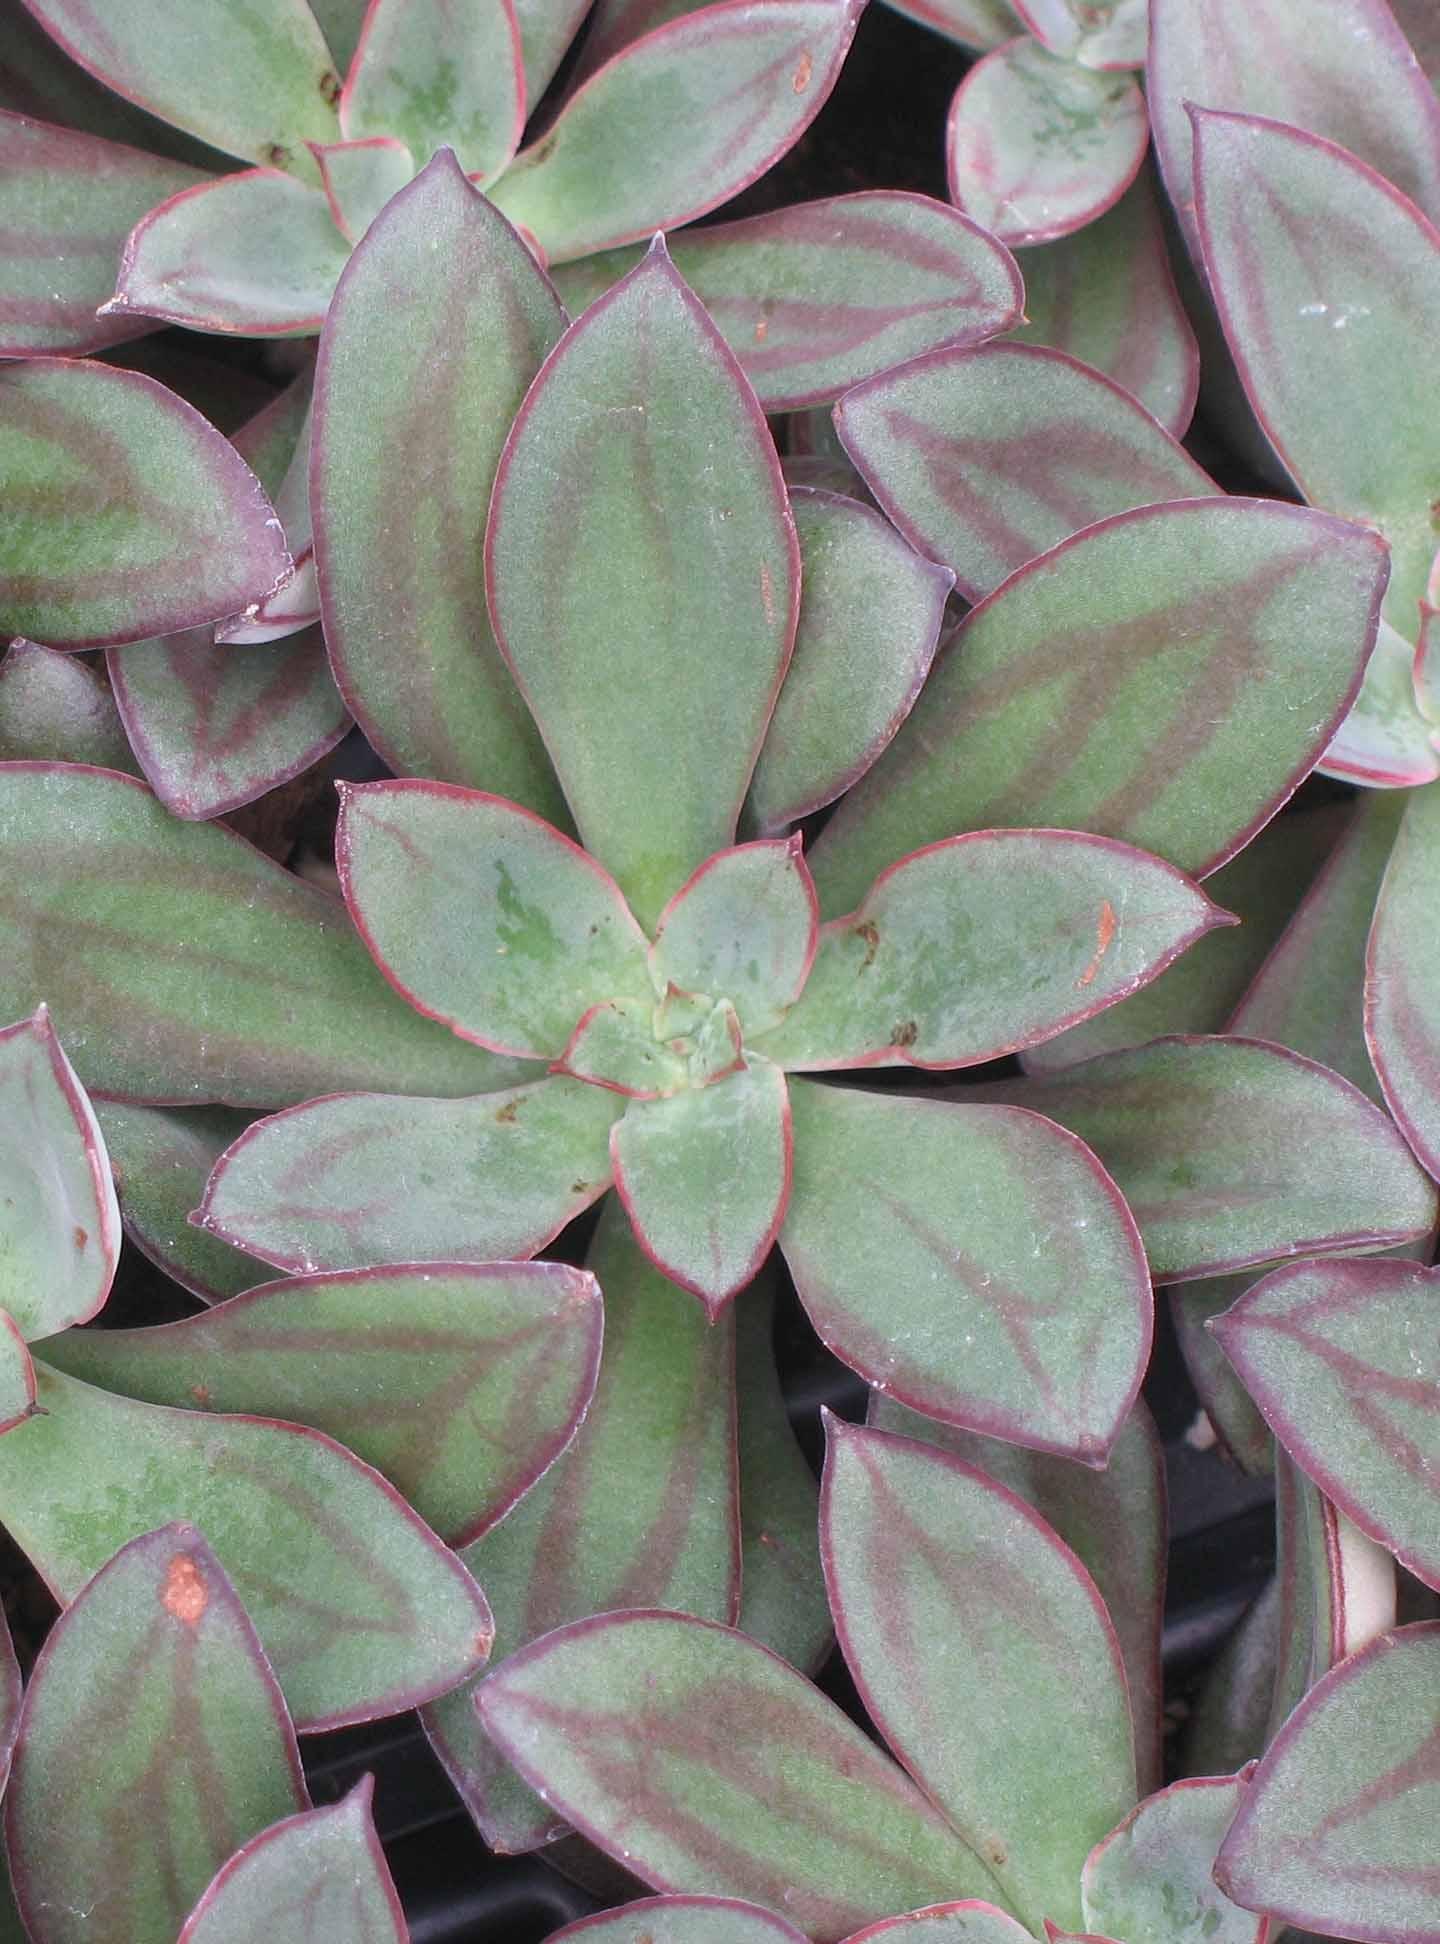 Echeveria Nodulosa Succulent Plants4home